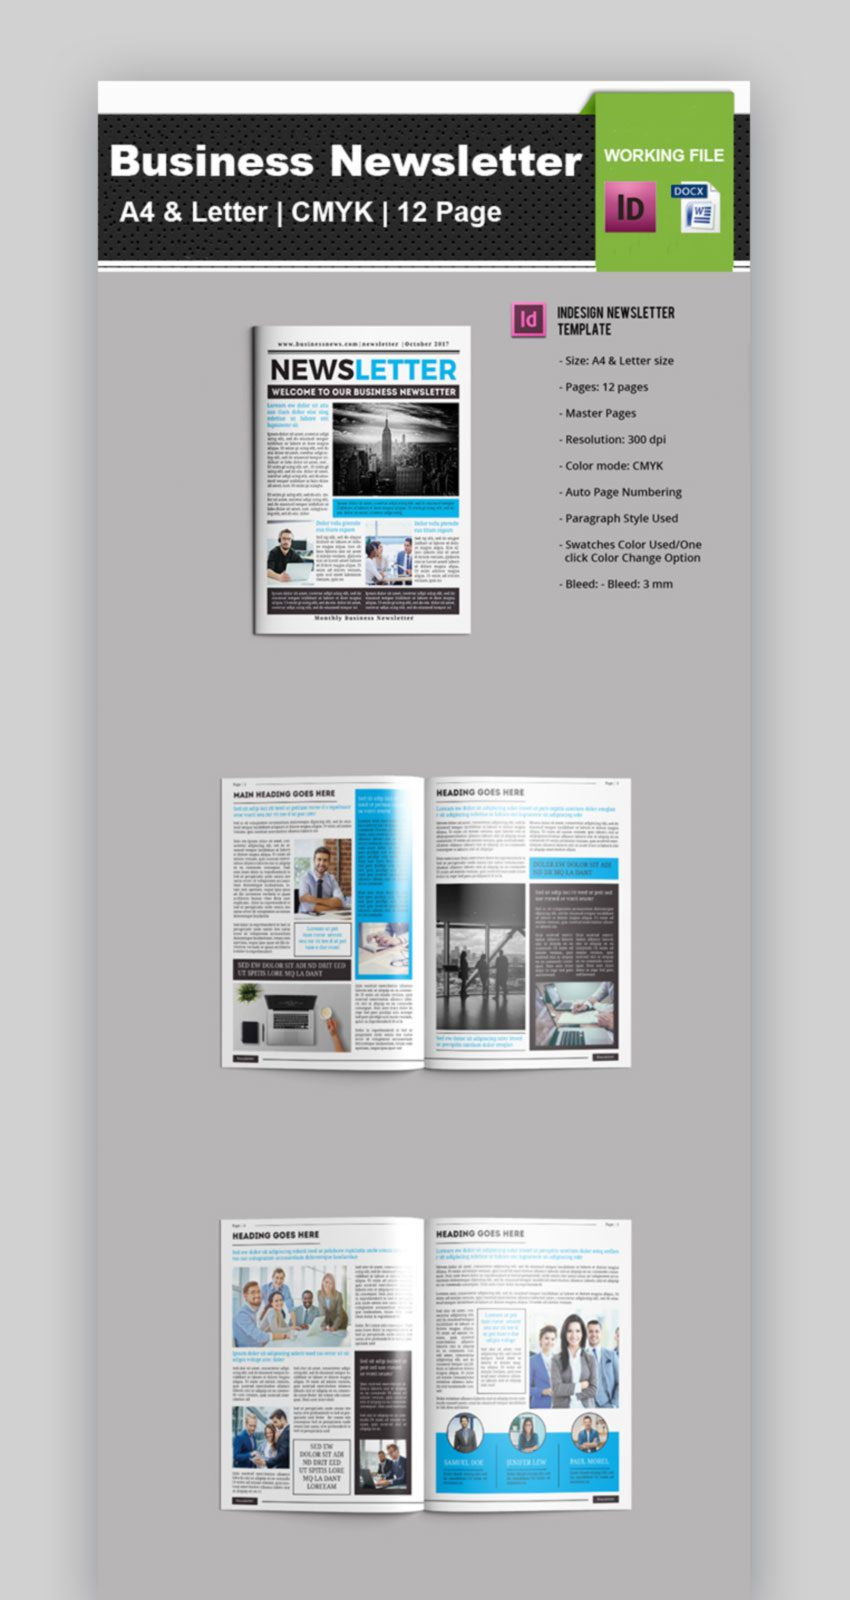 006 Sensational Publisher Newsletter Template Free Inspiration  Microsoft Office DownloadFull